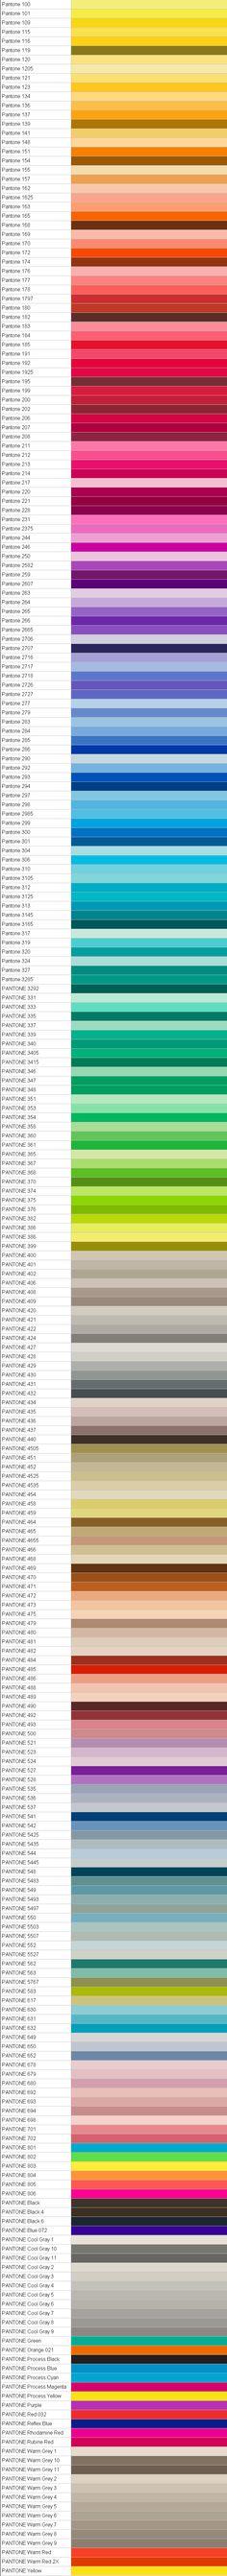 Just the Pantone palette.